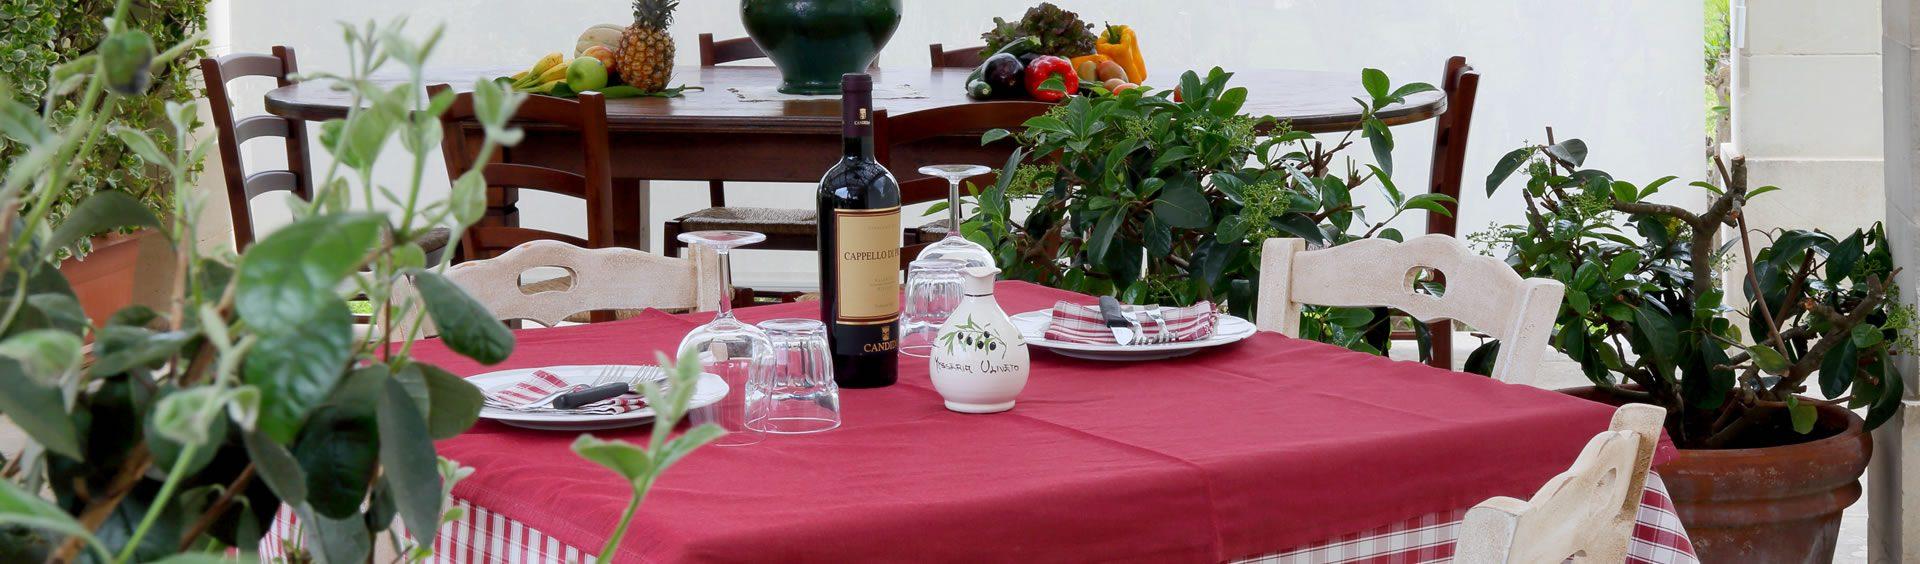 Masseria L'Uliveto